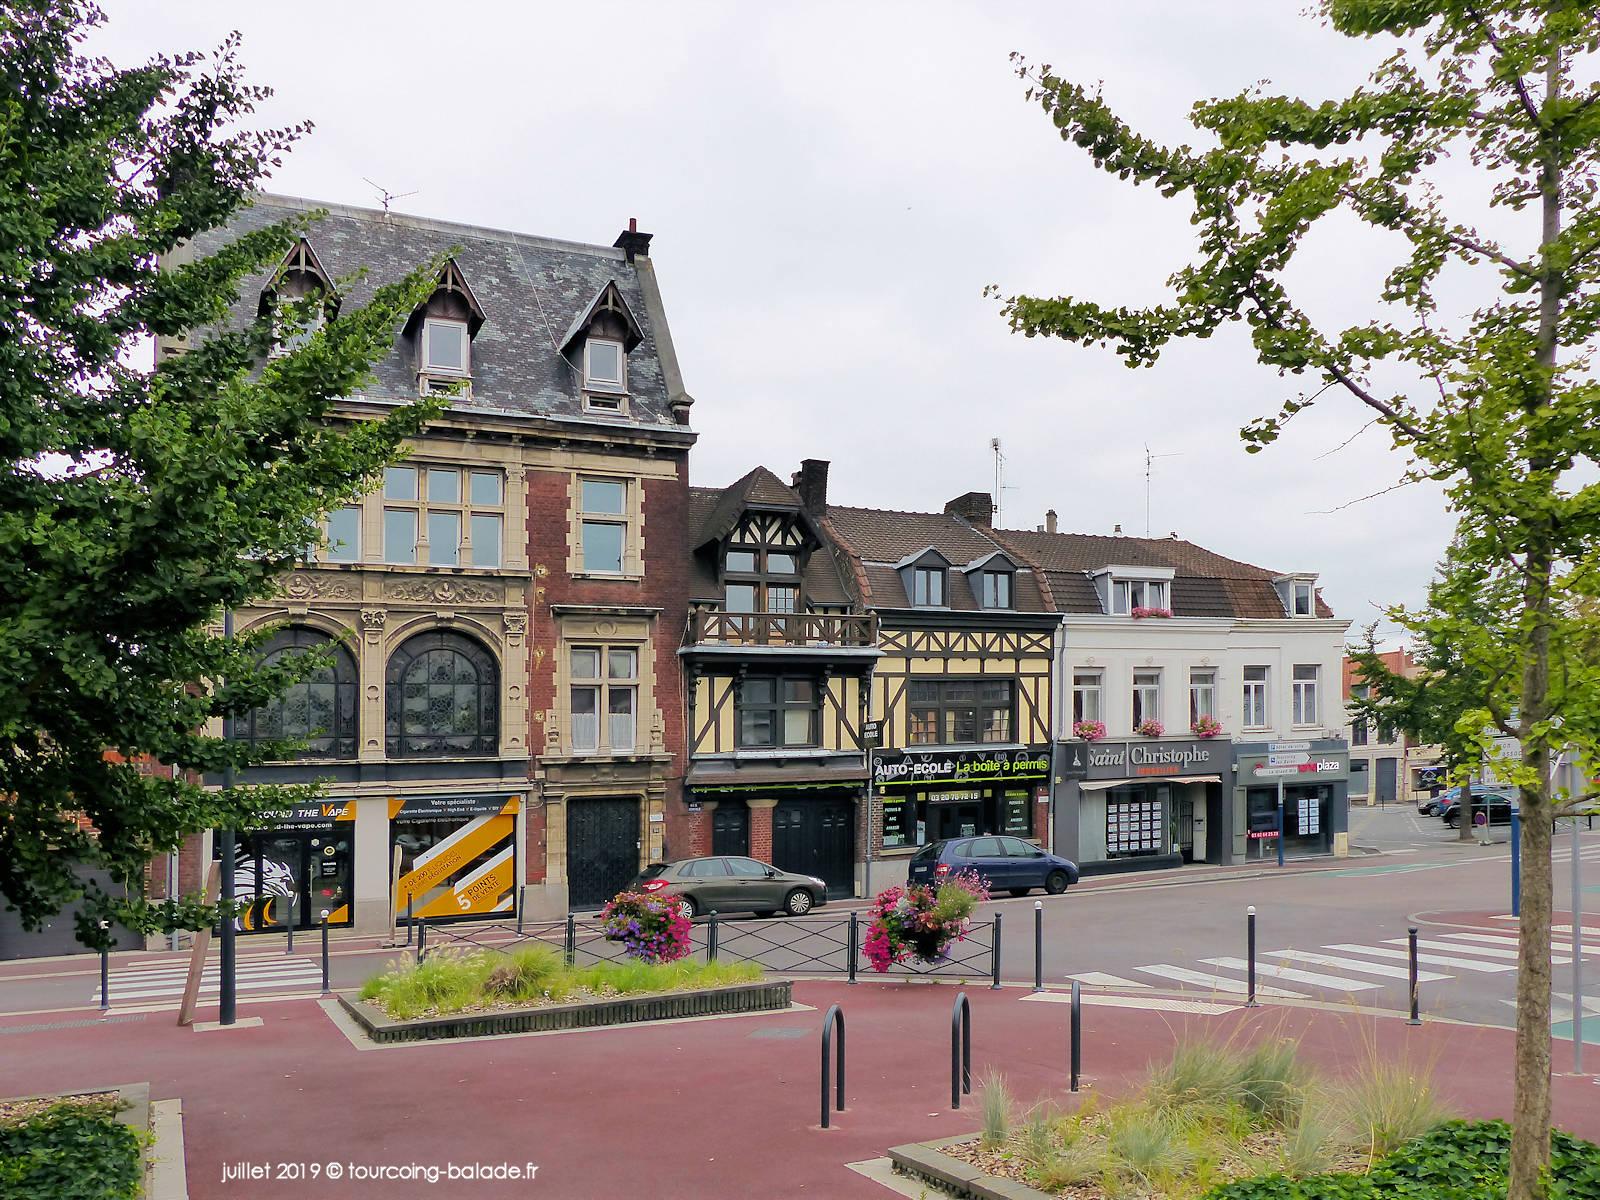 Around The Vape - Tourcoing Vapotage - 2019